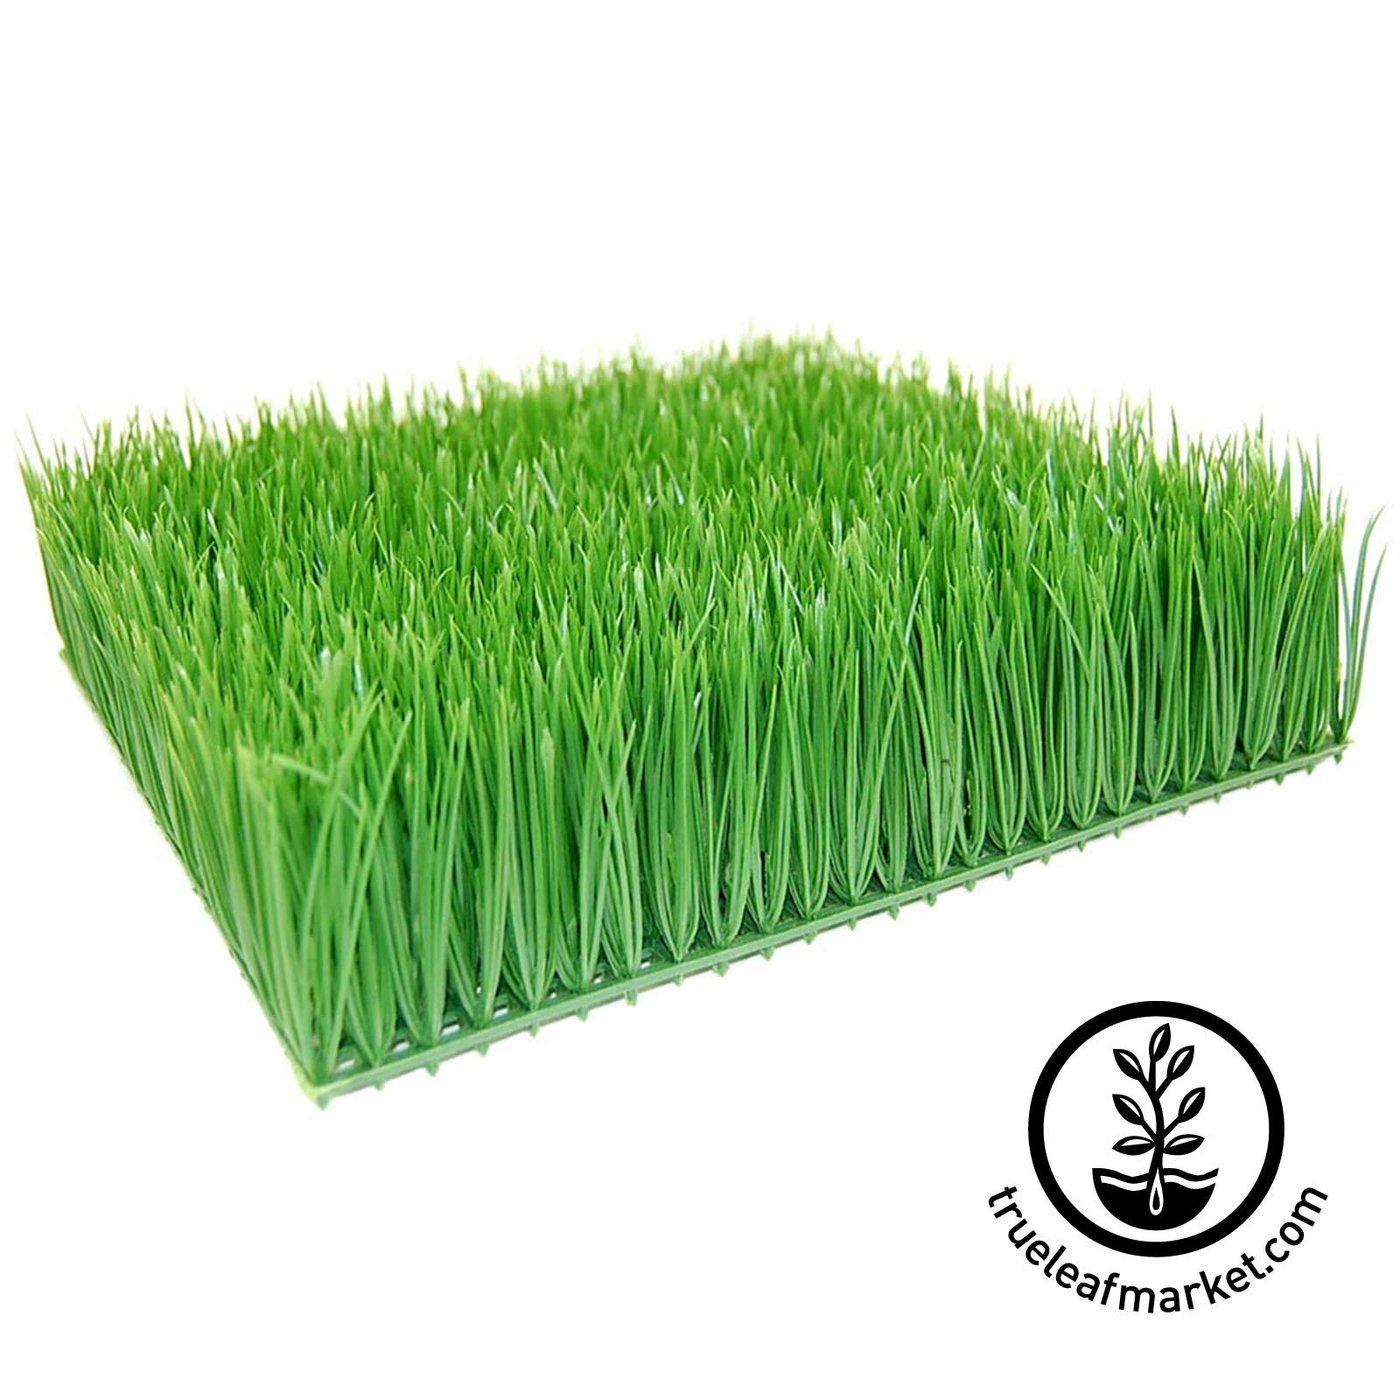 Decorative plastic artificial wheatgrass perfect for ornamental decorative plastic artificial wheatgrass perfect for ornamental useds fake plastic wheatgrass squares can workwithnaturefo